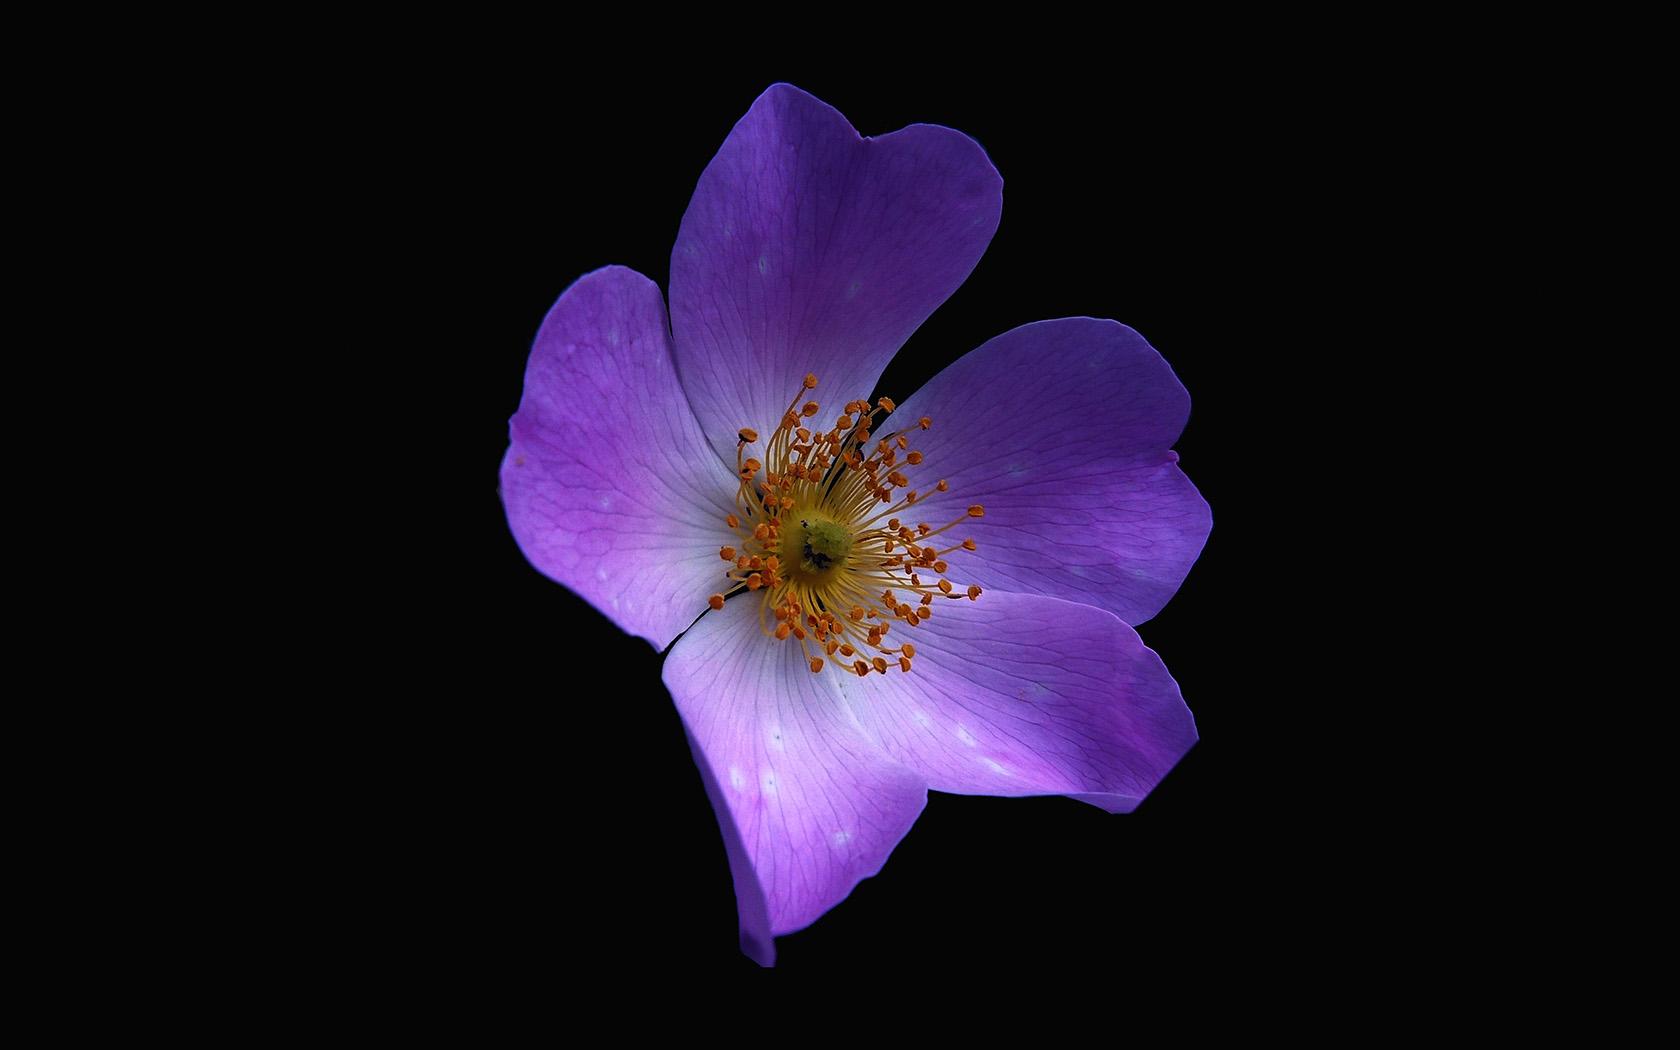 nr38-macro-flower-dark-purple-nature-wallpaper